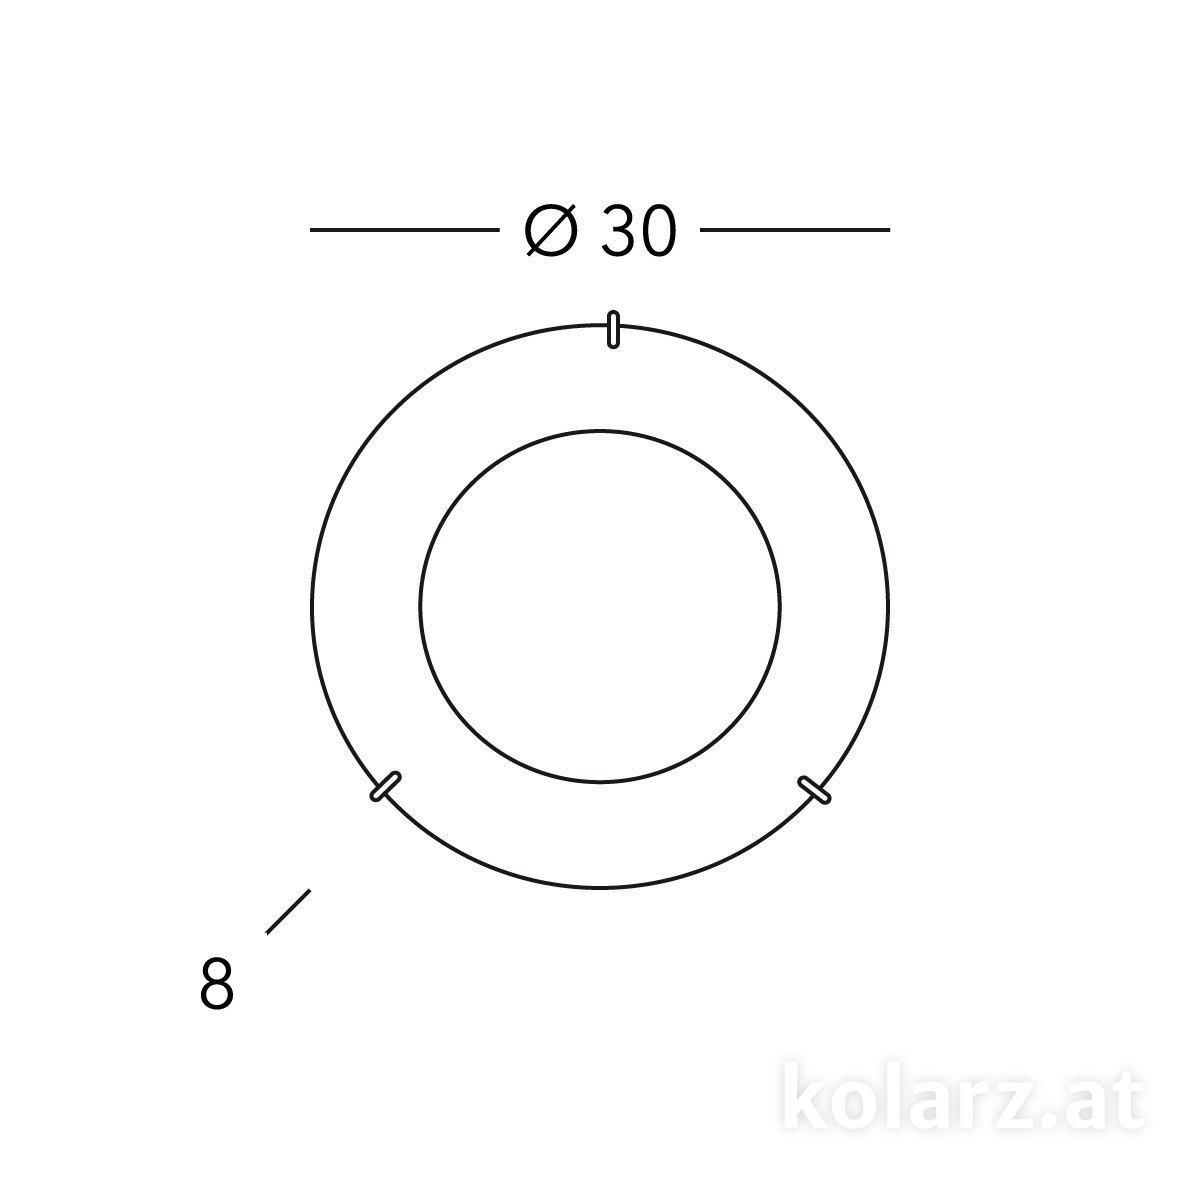 A1306-11-3-SunWg-s1.jpg